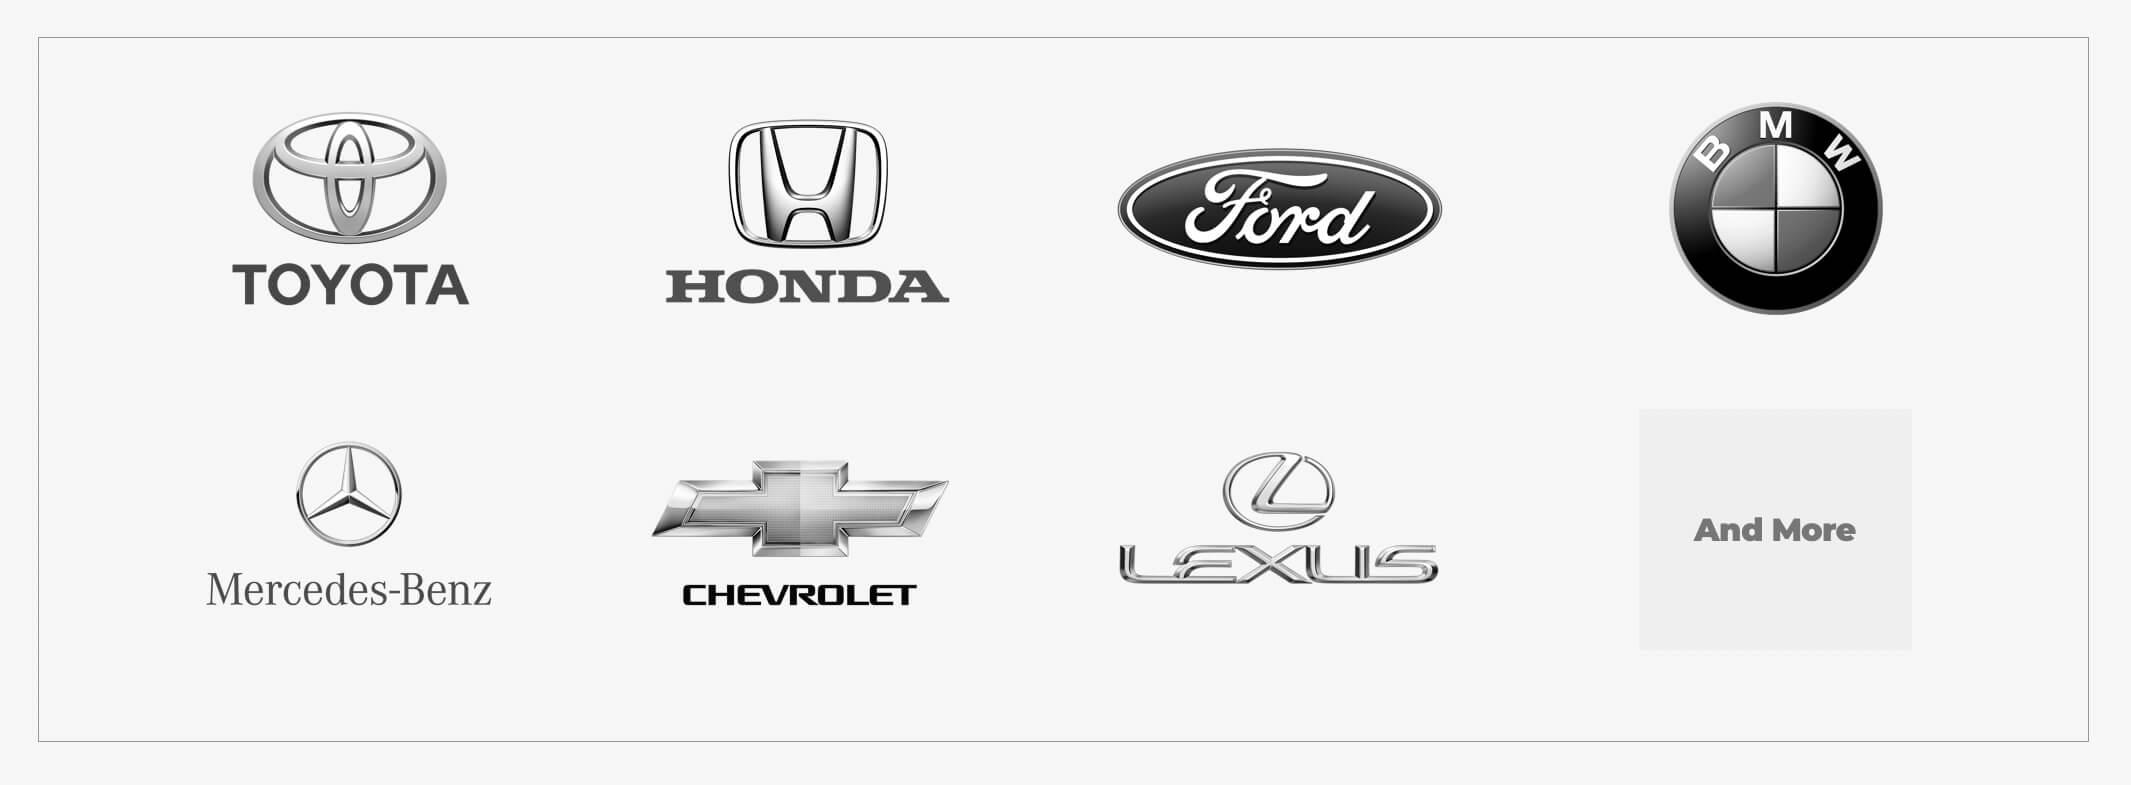 Tires_Panel.jpg